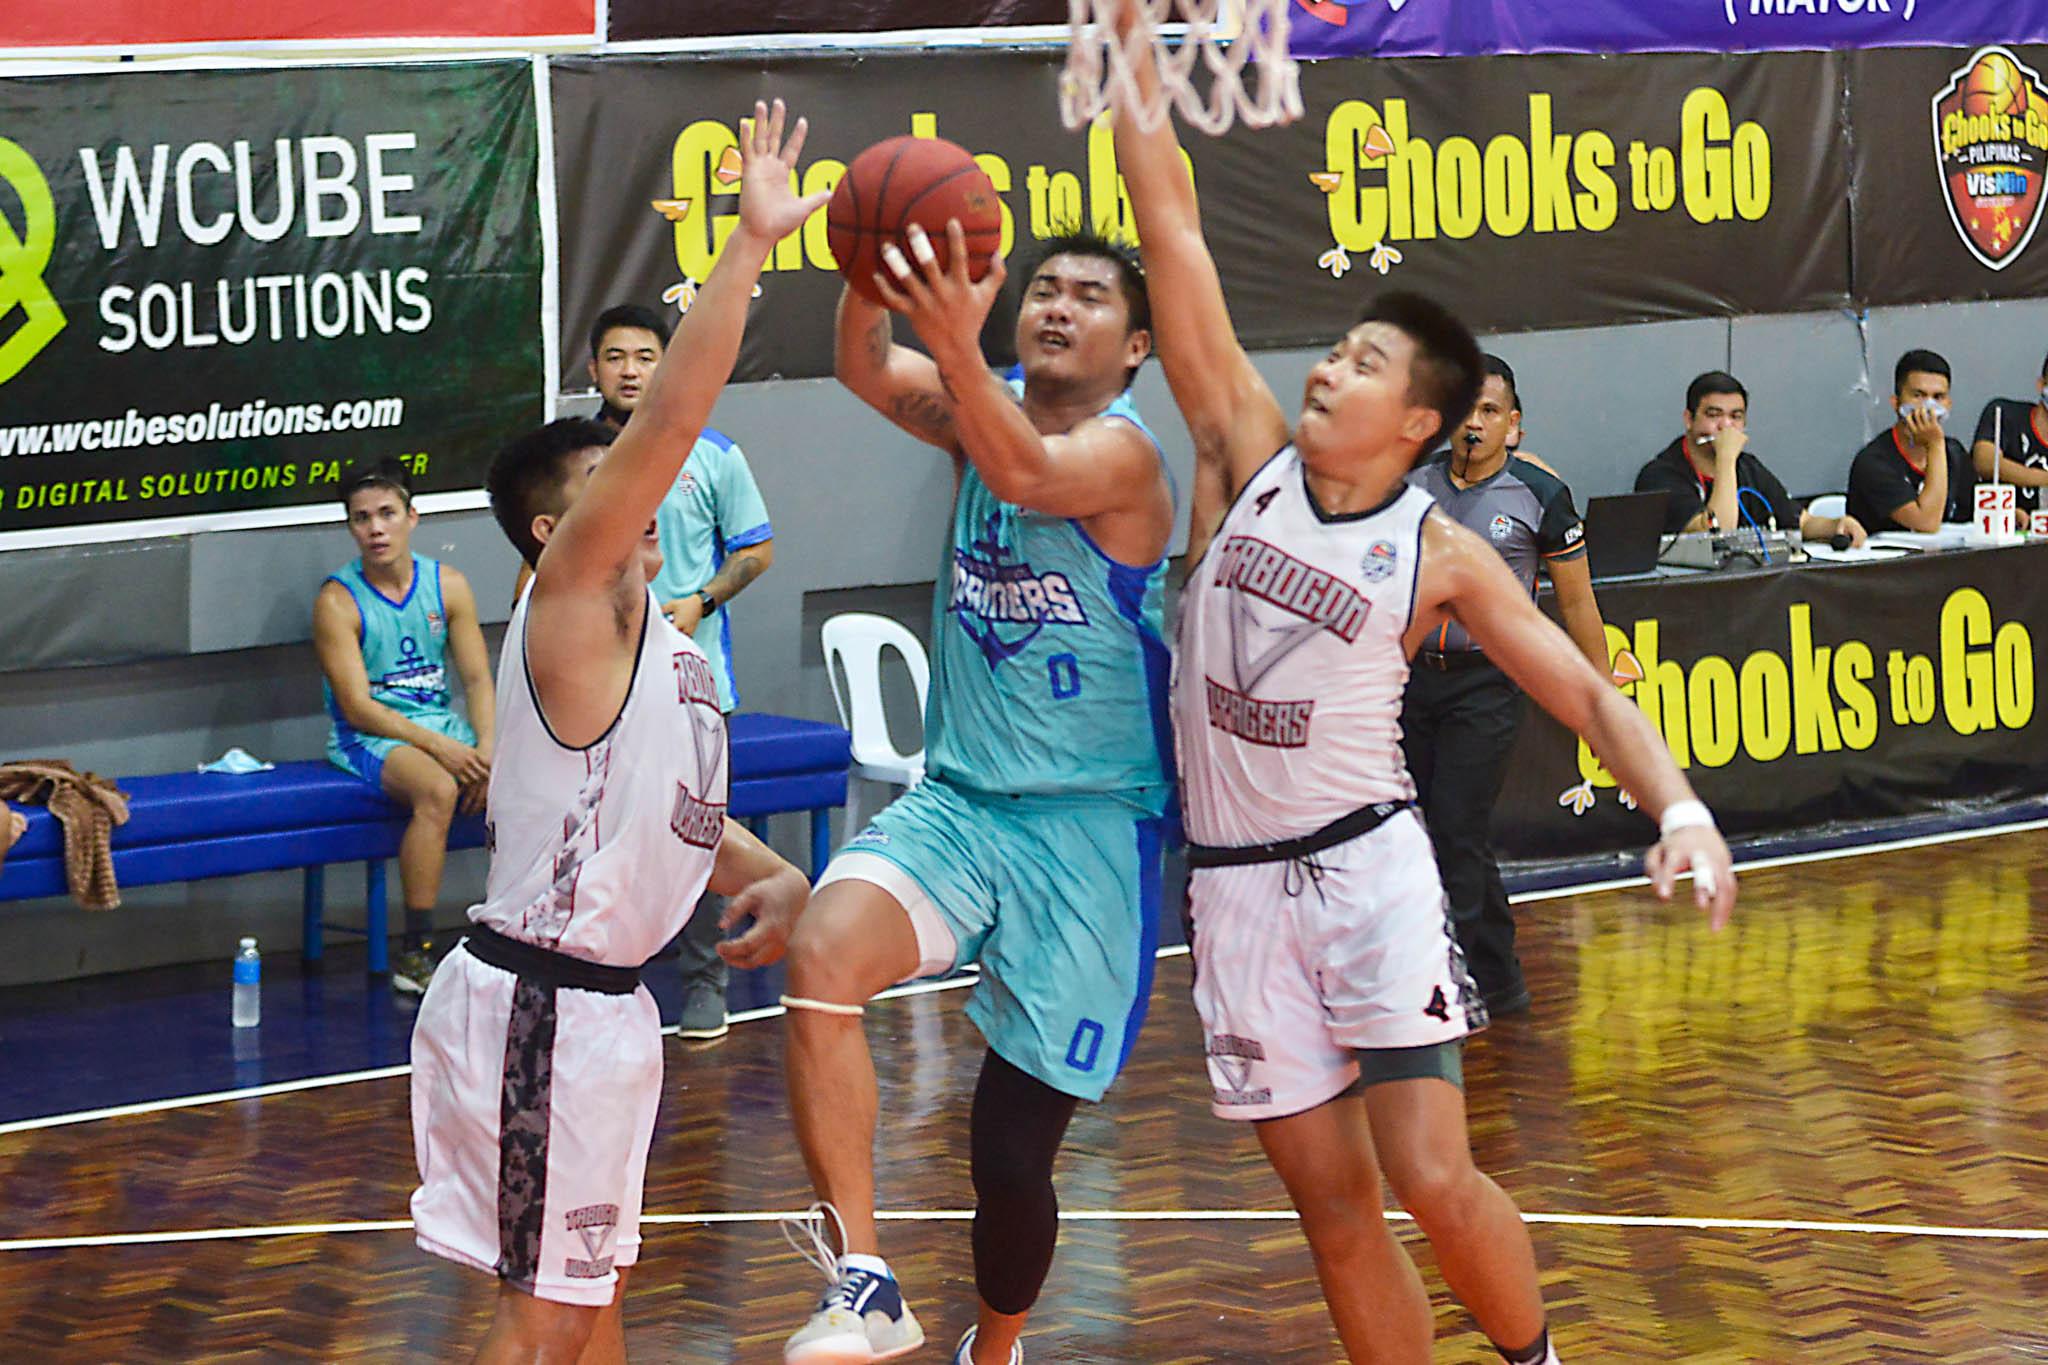 2021-Chooks-to-Go-VisMin-Cup-Visayas-Tabogon-vs-Tubigon-Joseph-Marquez-2 Tubigon Bohol's lady boss proves to be lucky charm for Mariners Basketball News VisMin Super Cup  - philippine sports news